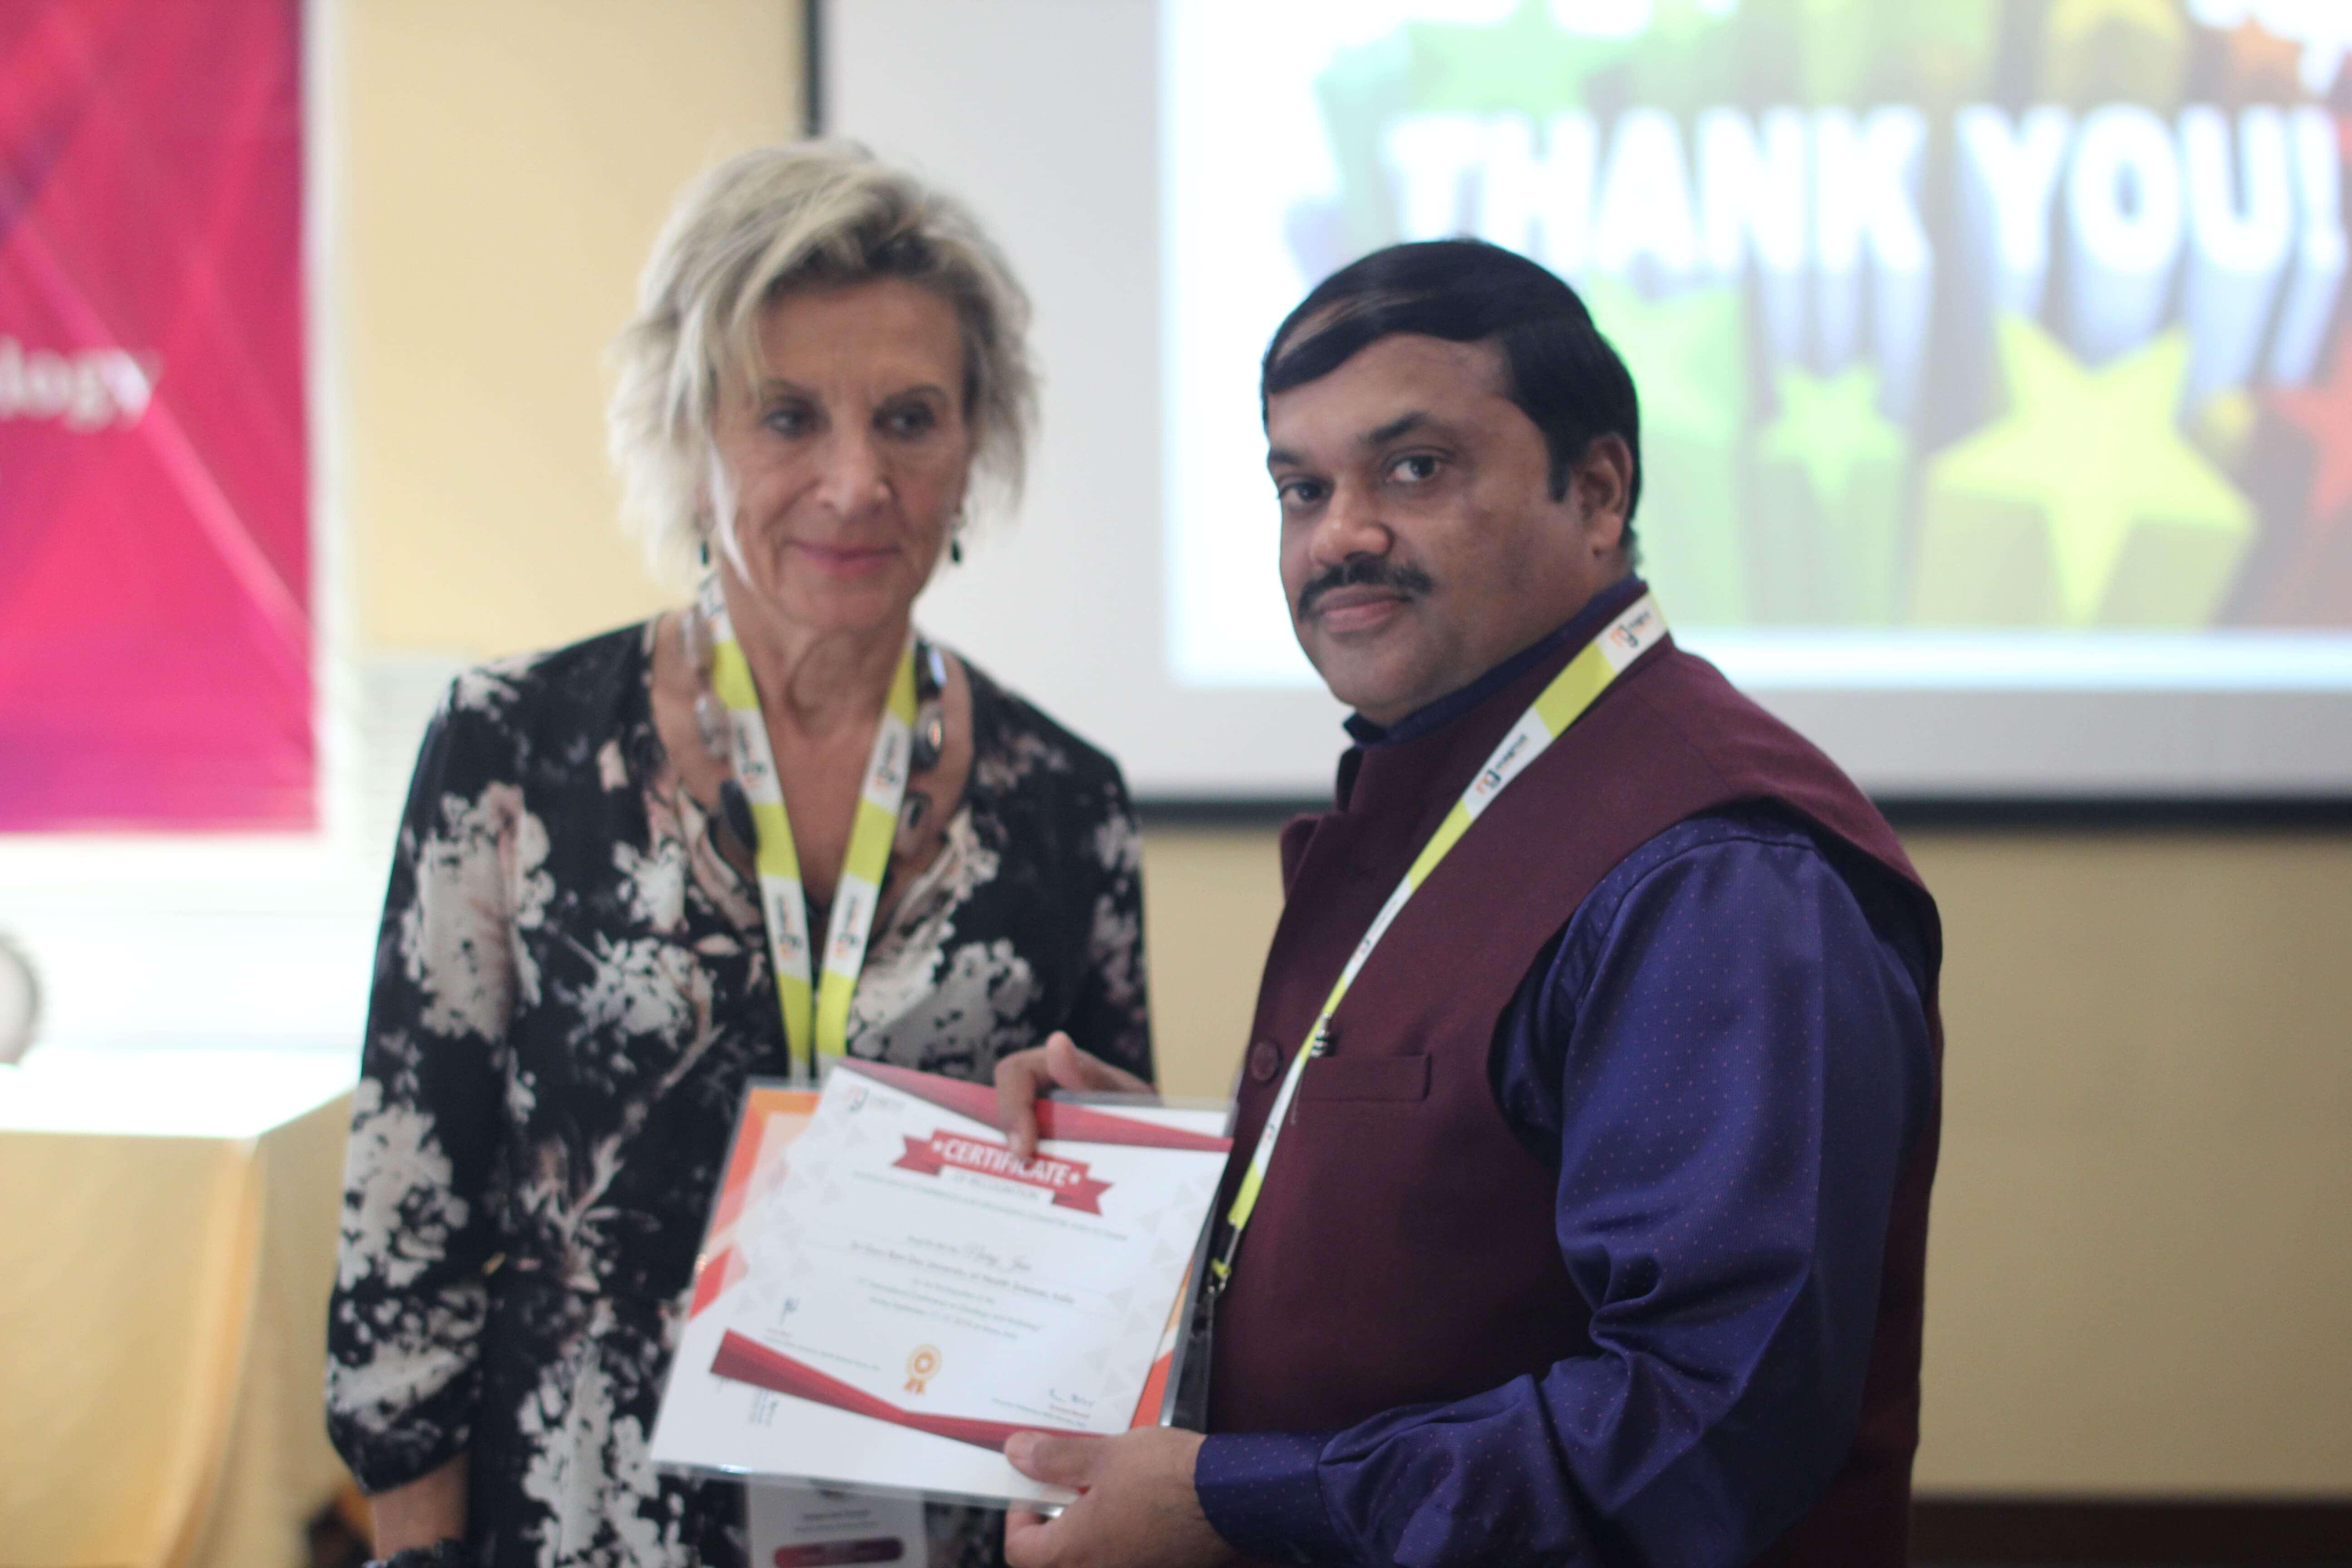 Cancer conference - Neeraj Jain